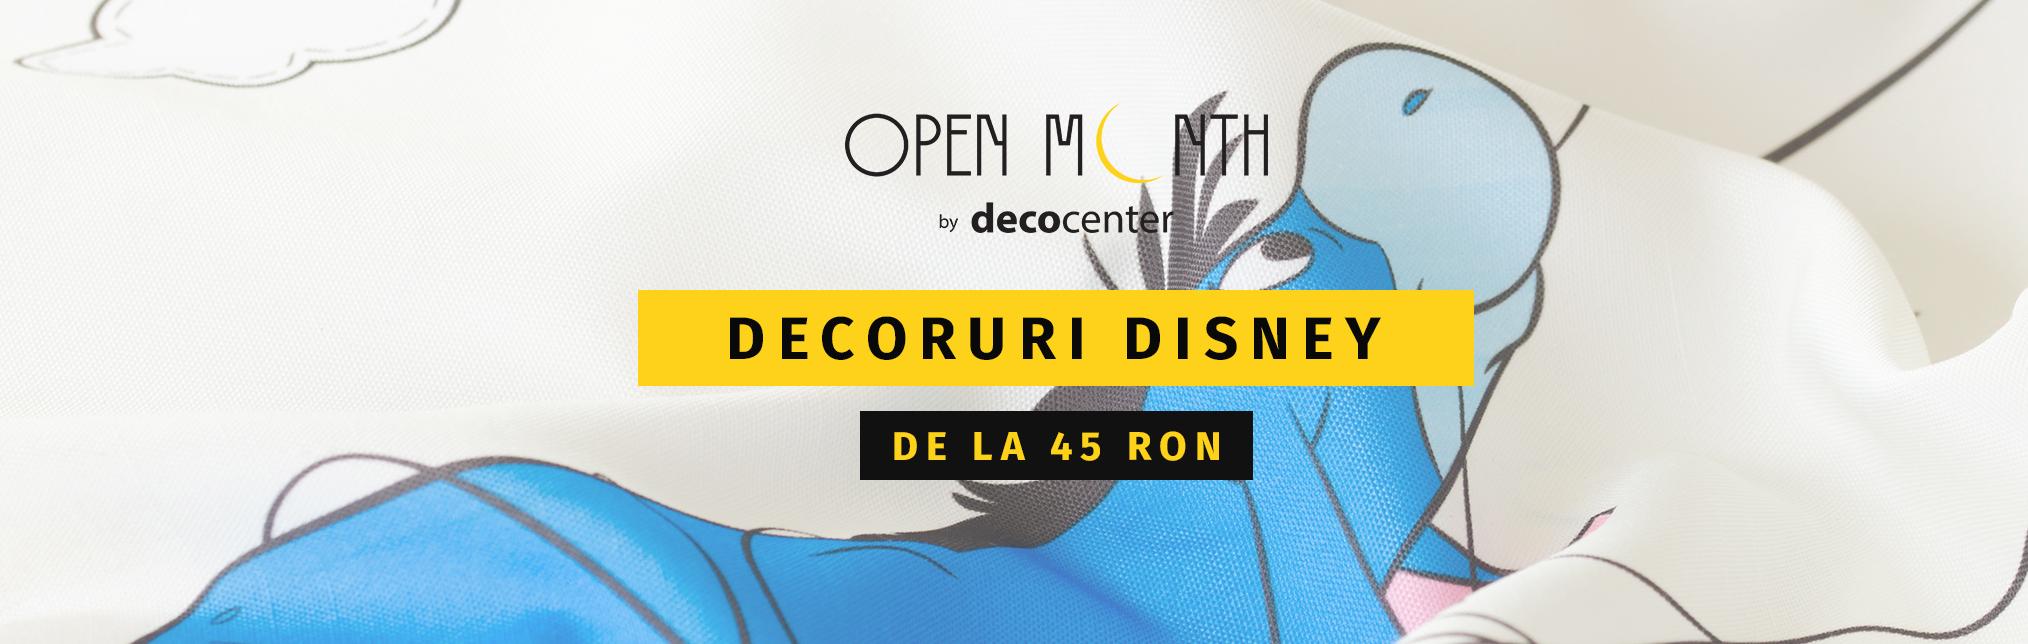 open m 4